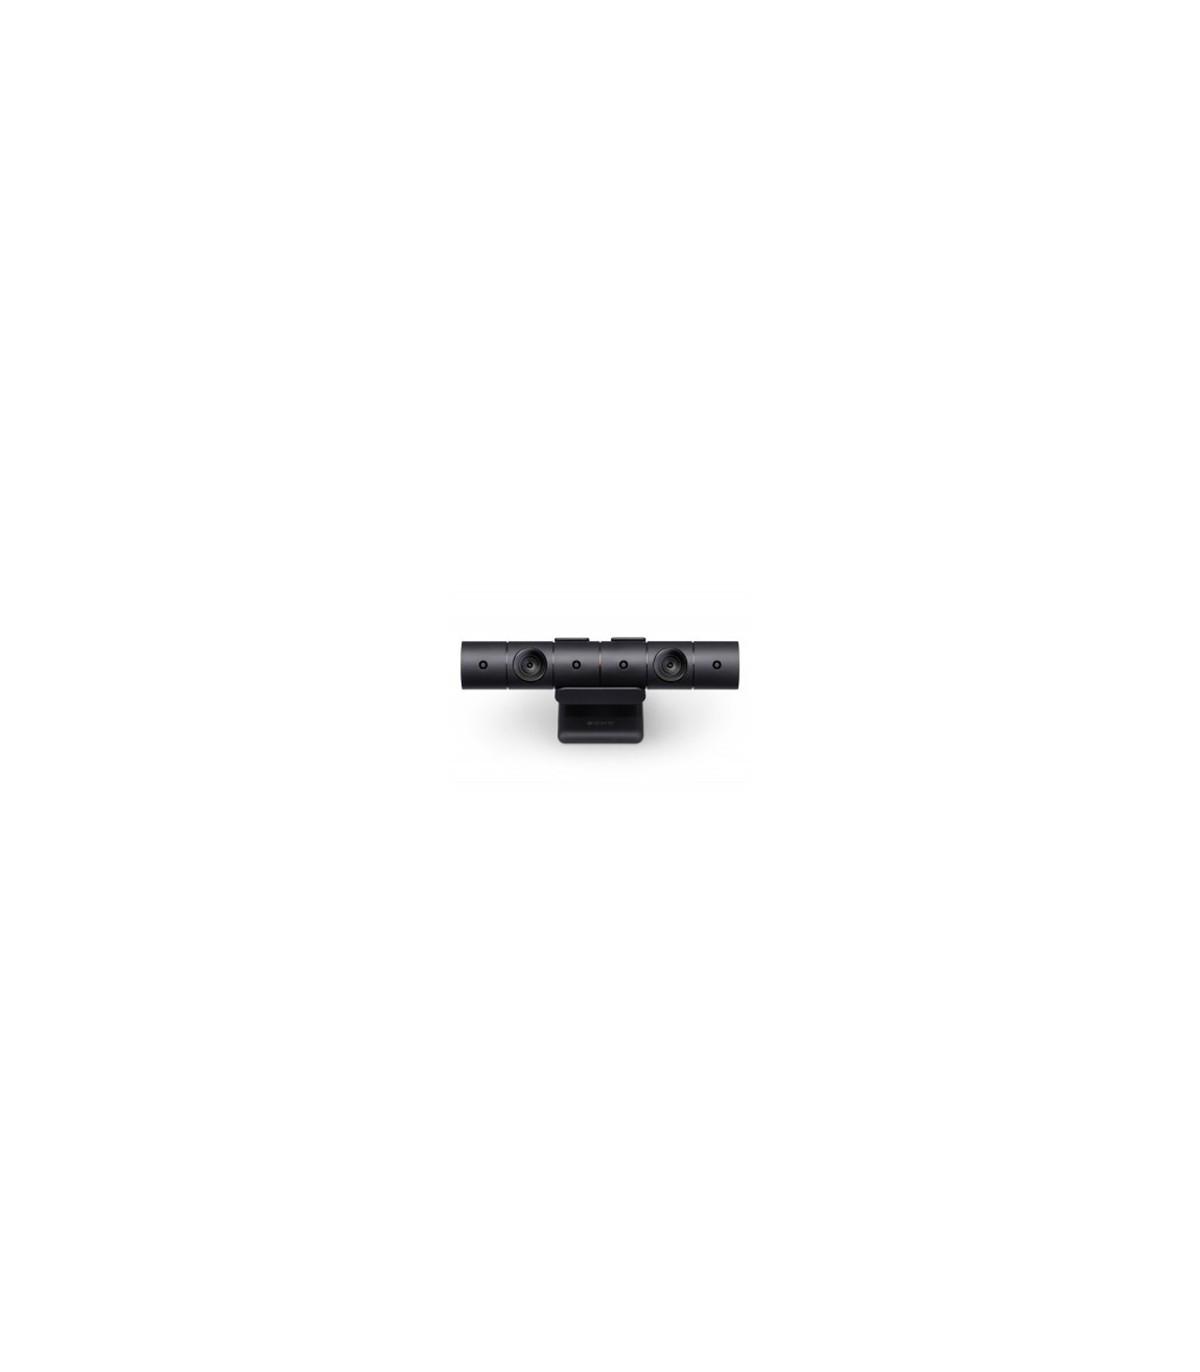 Sony PlayStation 4 Slim Camera